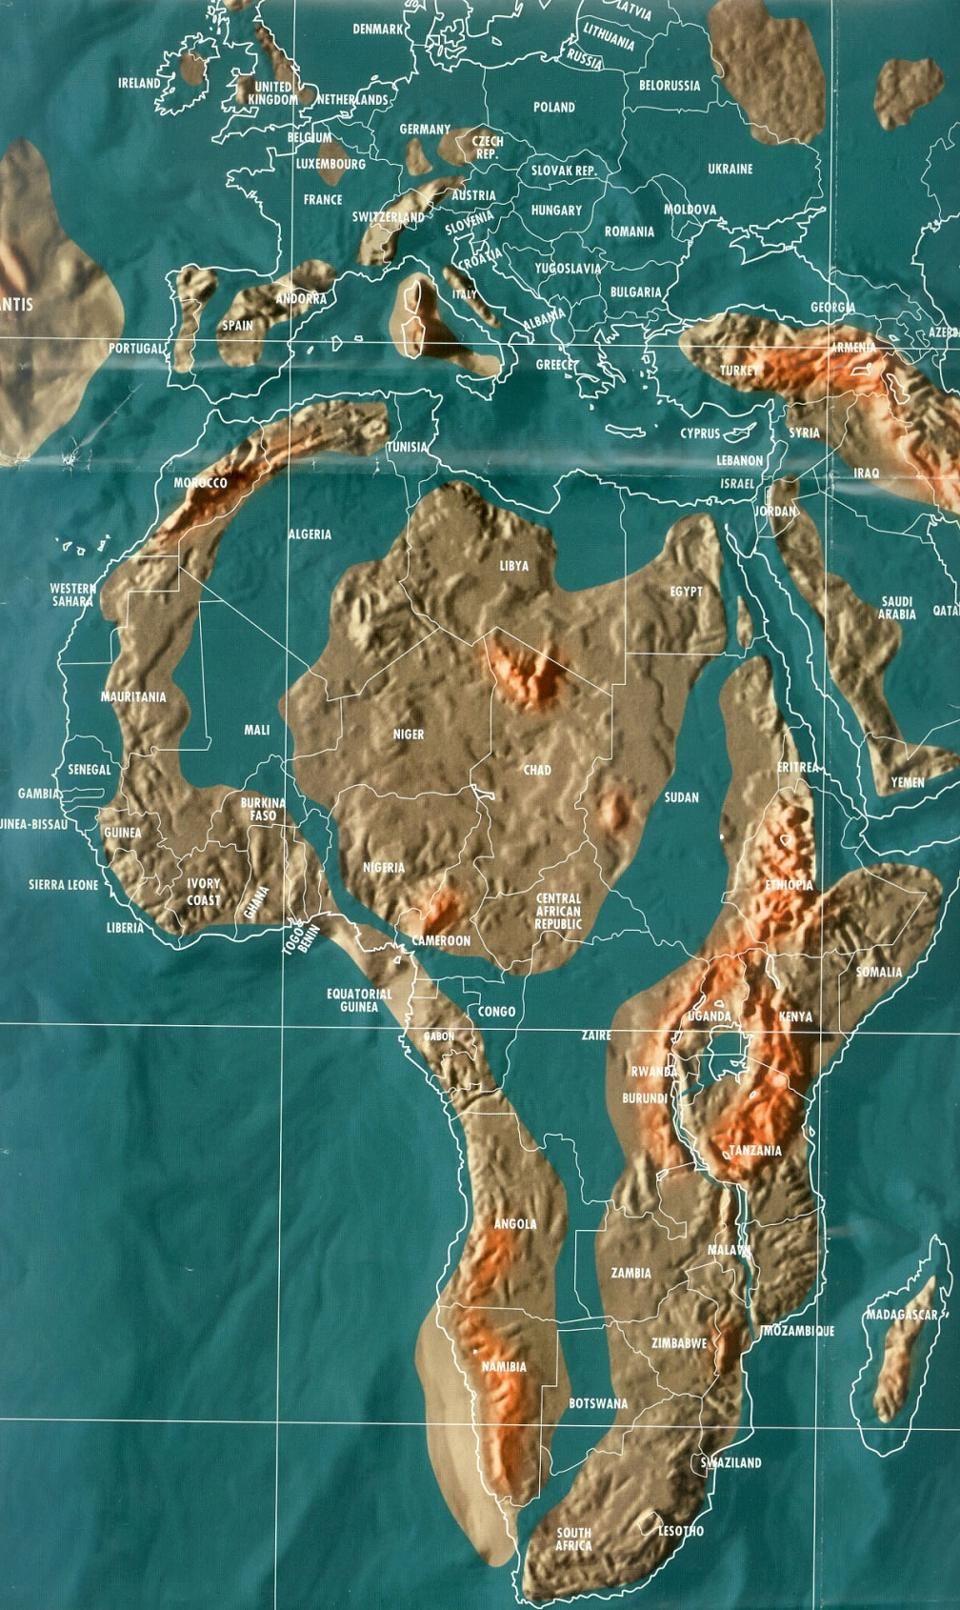 2012 glorious hope soli deo gloria maps of the global coastal event and a possible future world